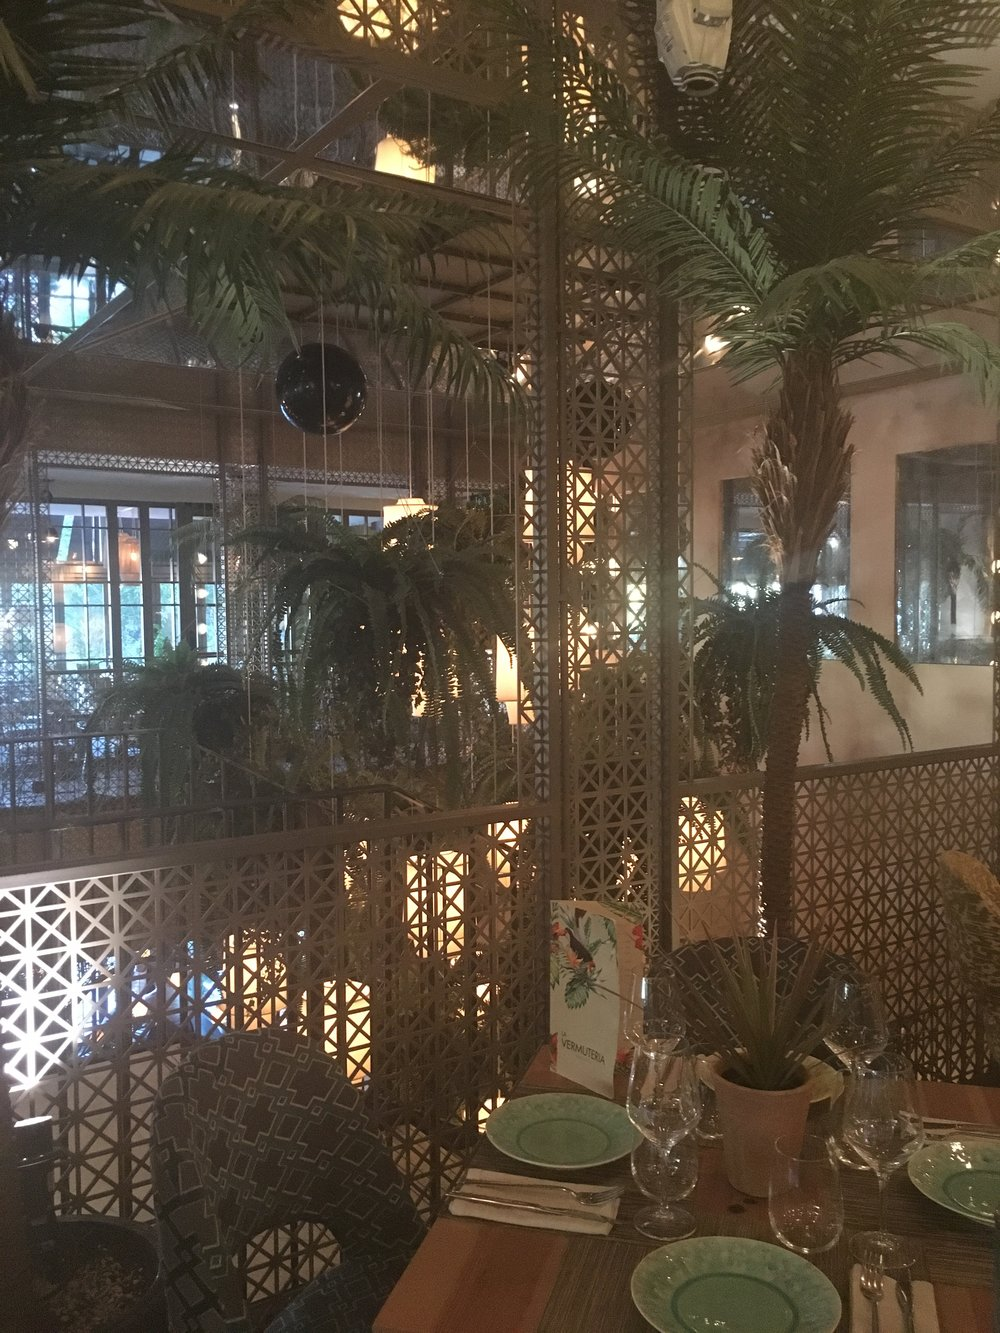 habanera restaurant